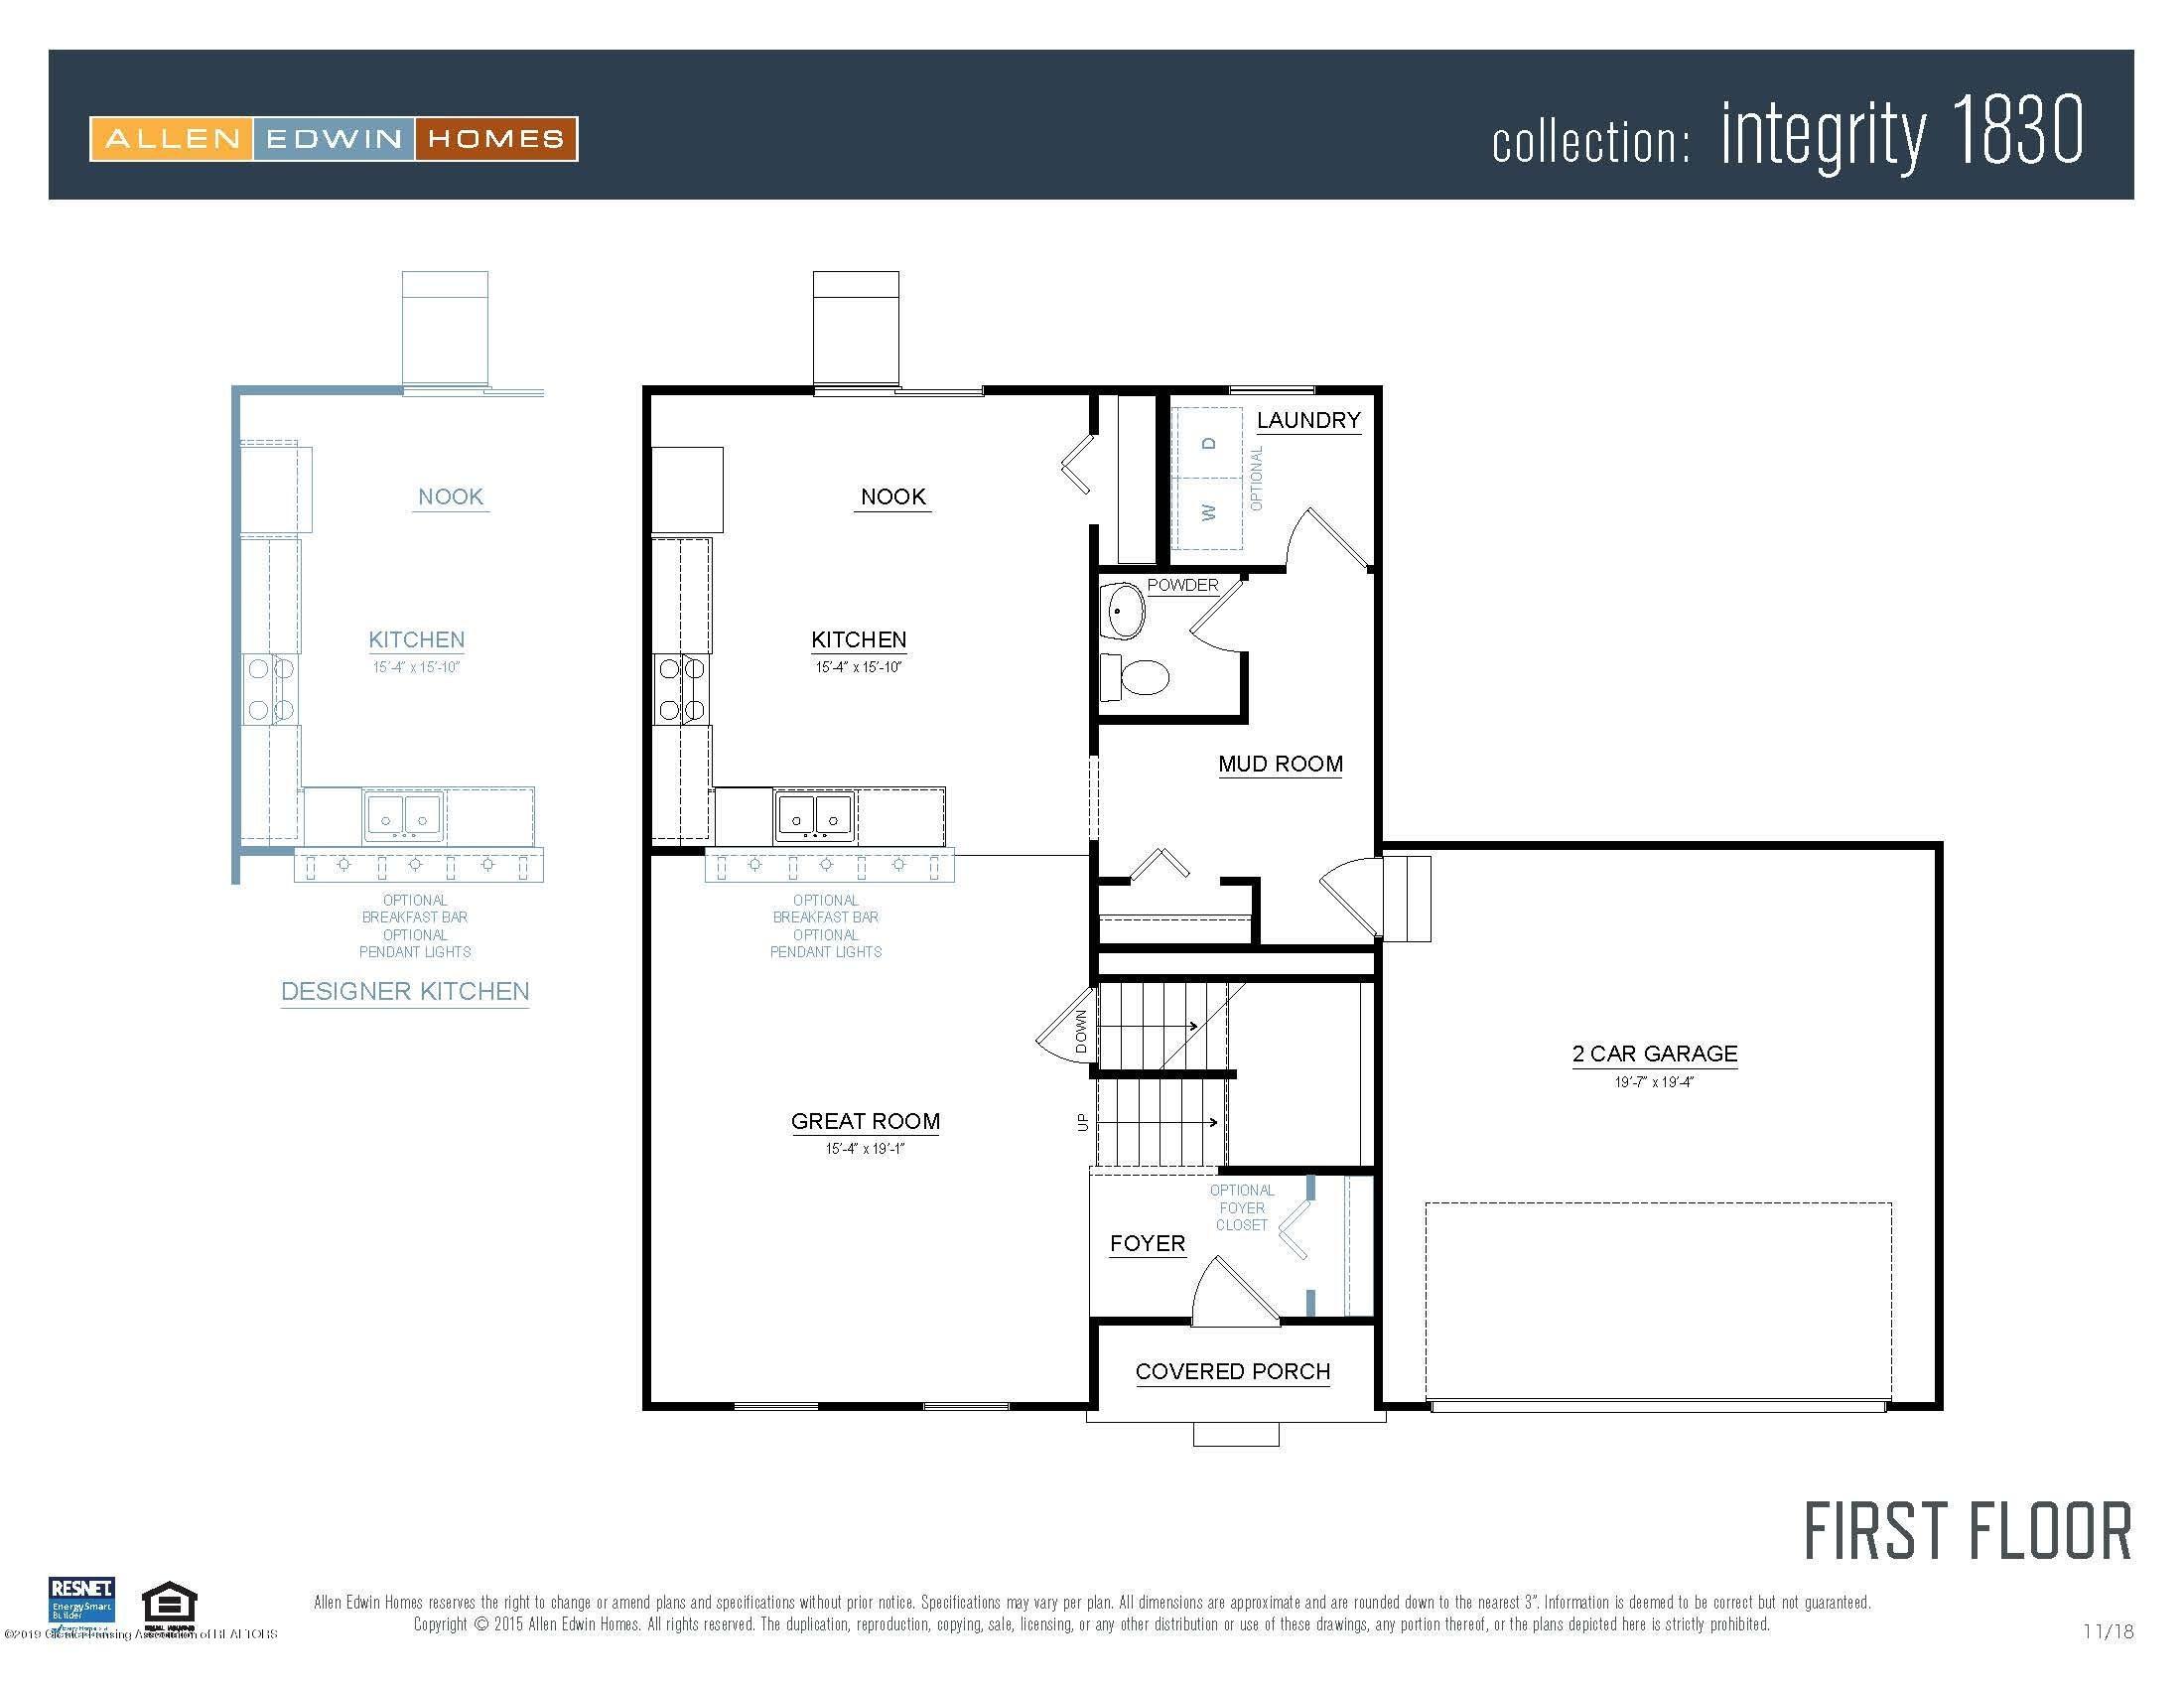 1125 River Oaks Dr - Integrity 1830 V8.0a First Floor - 3